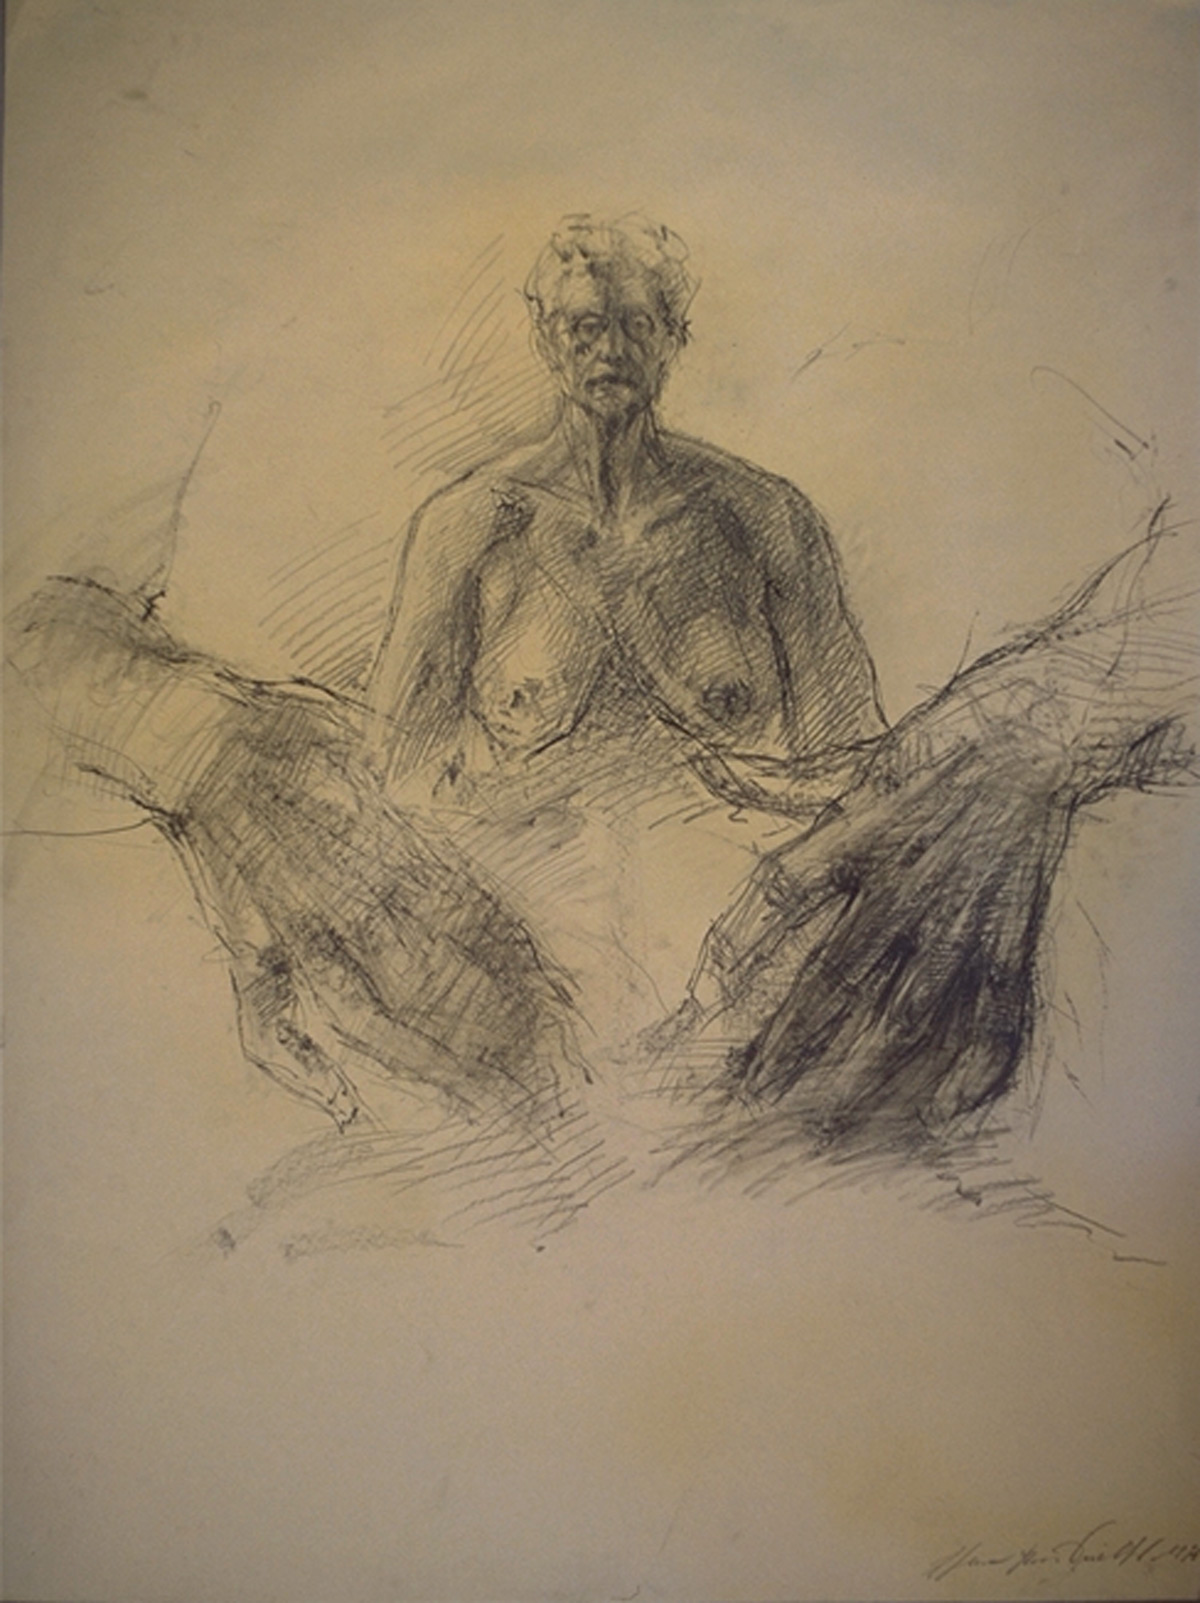 Elena-Mutinelli-30-etra-studio-tommasi